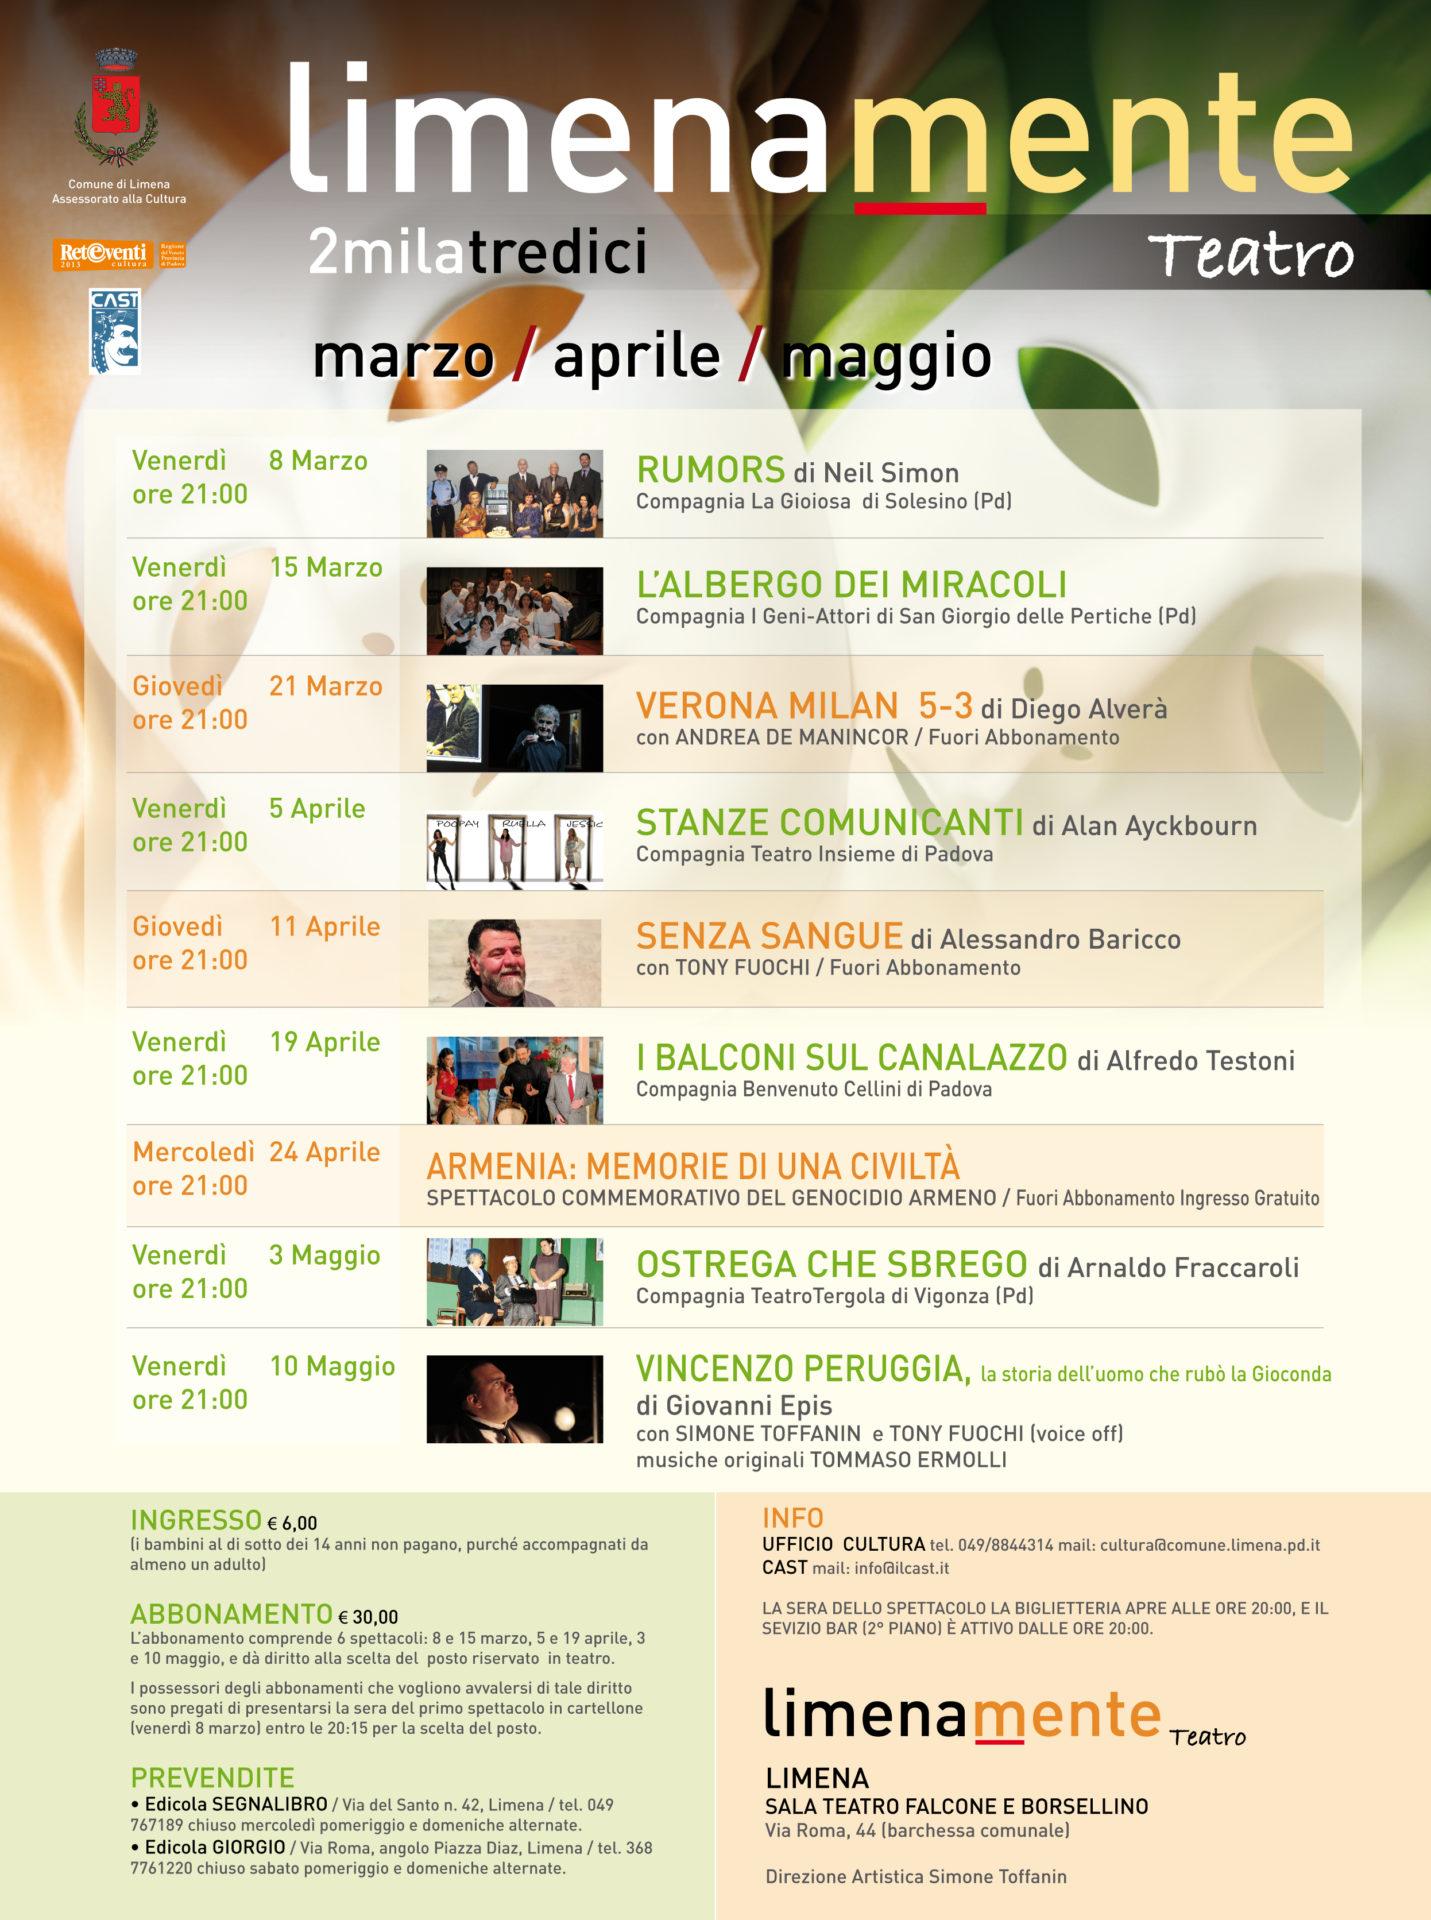 Limenamente Teatro primavera 2013